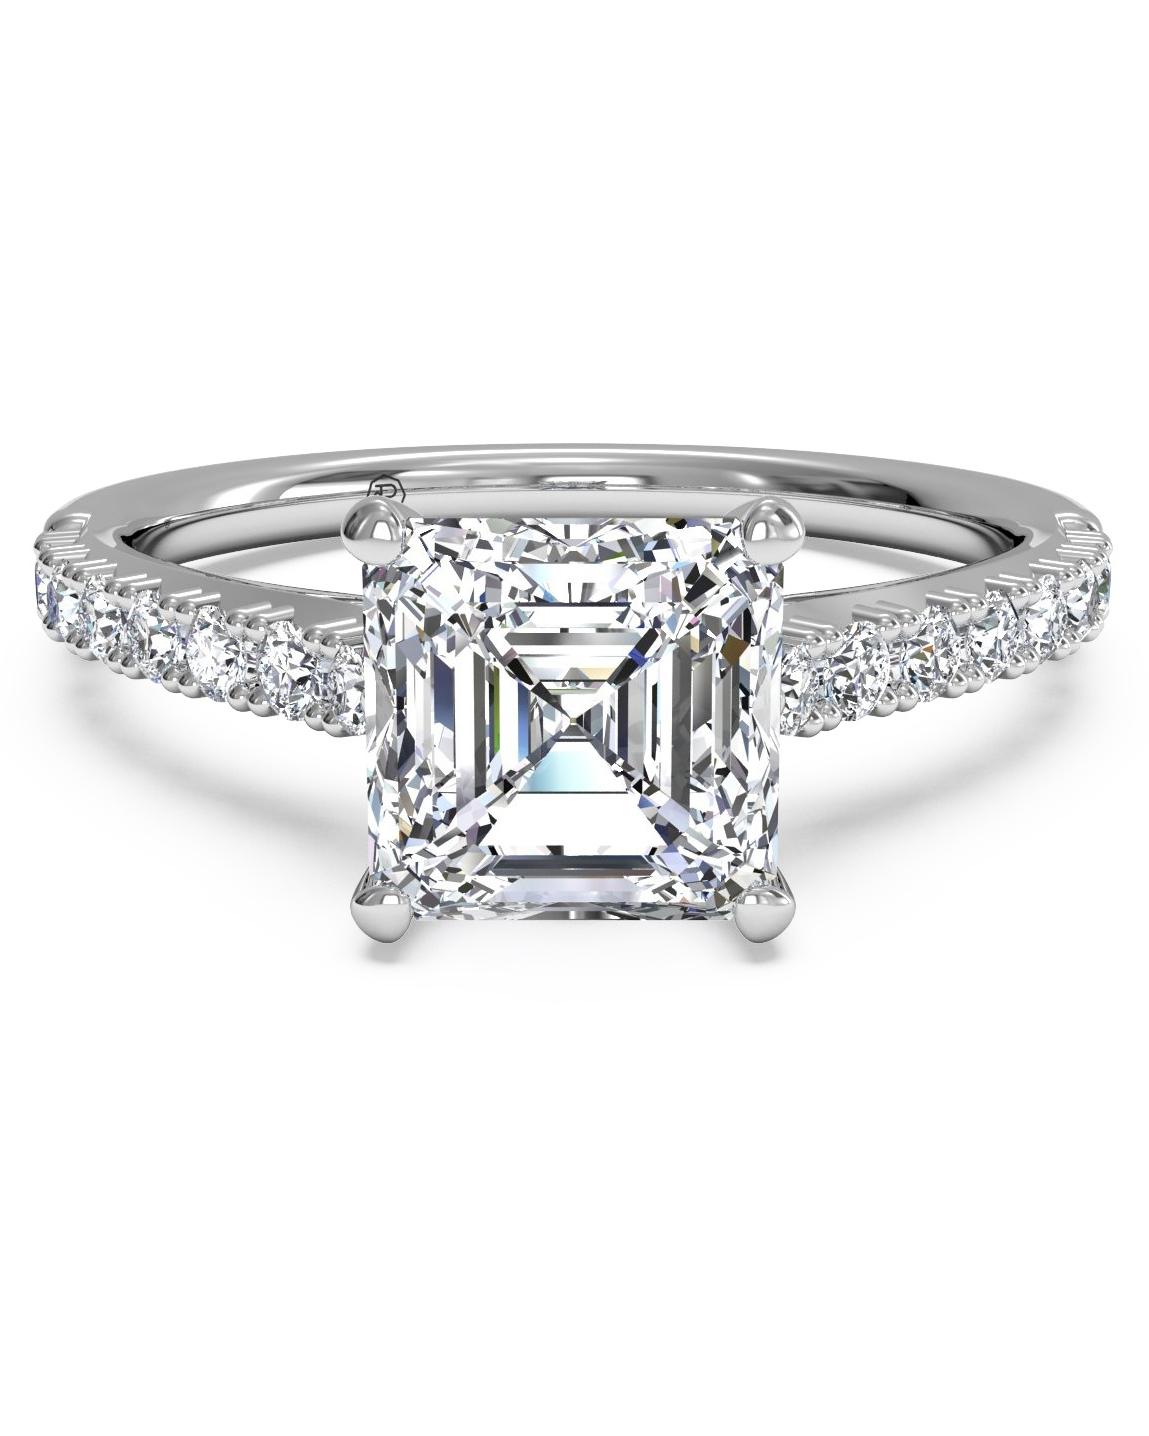 ritani-princess-cut-engagement-ring-one-0816.jpg